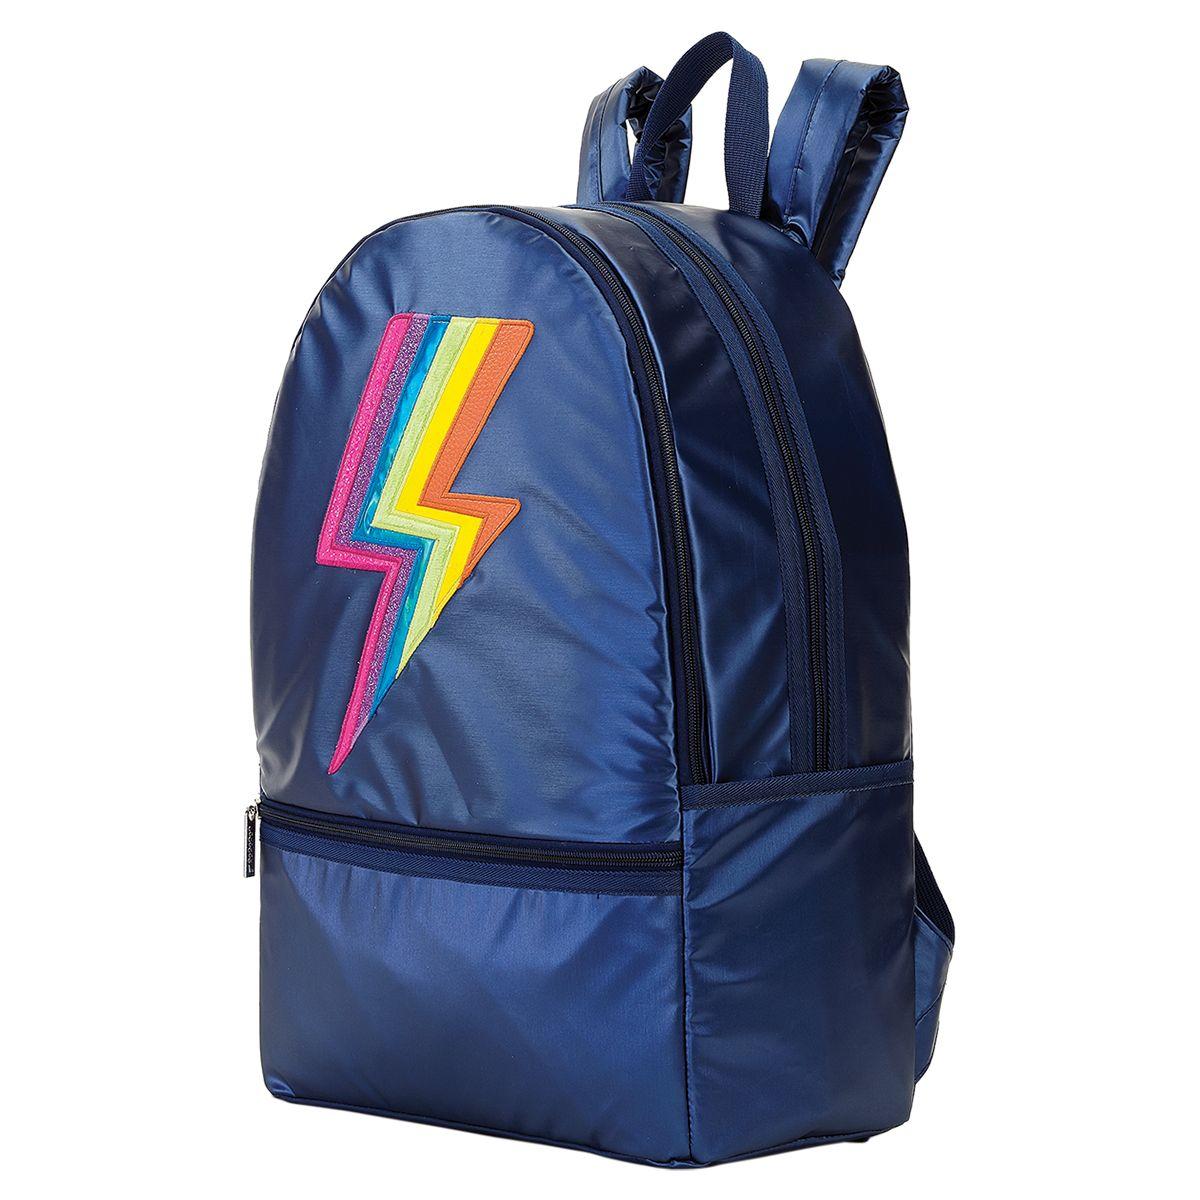 Personalized Metallic Rainbow Lightning Backpack